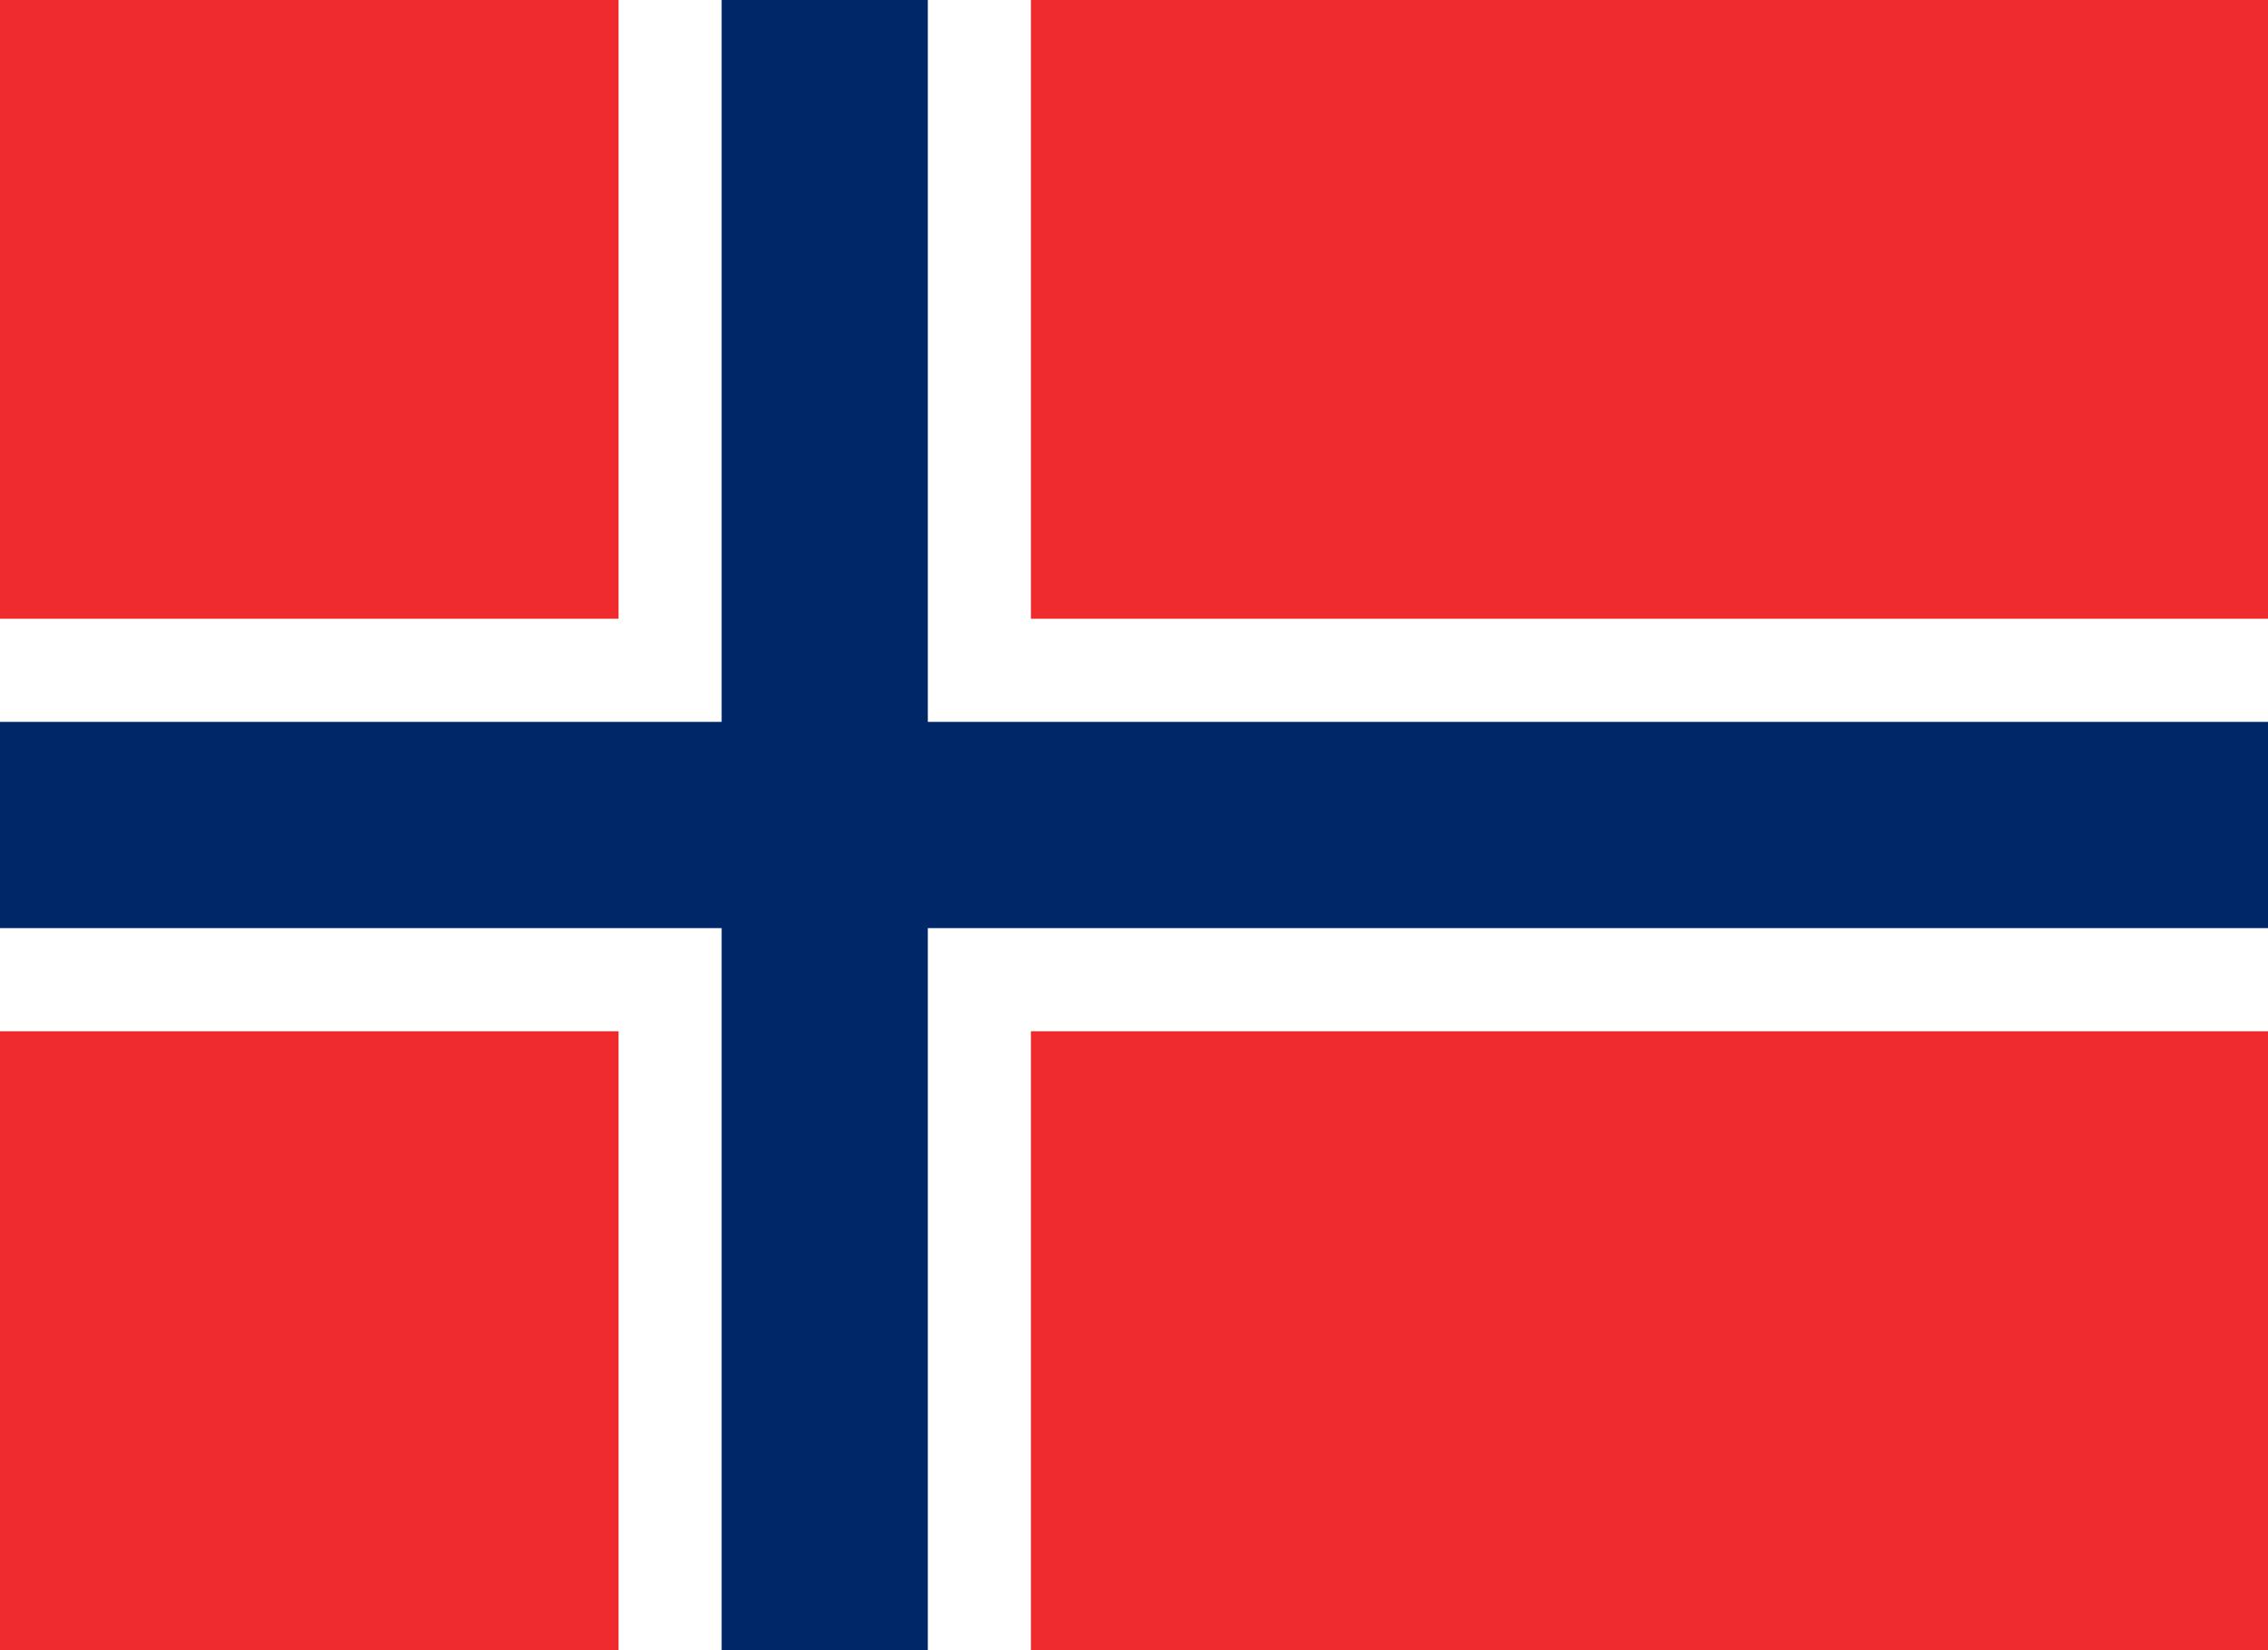 noruega, país, emblema, insignia, प्रतीक - HD वॉलपेपर - प्रोफेसर-falken.com